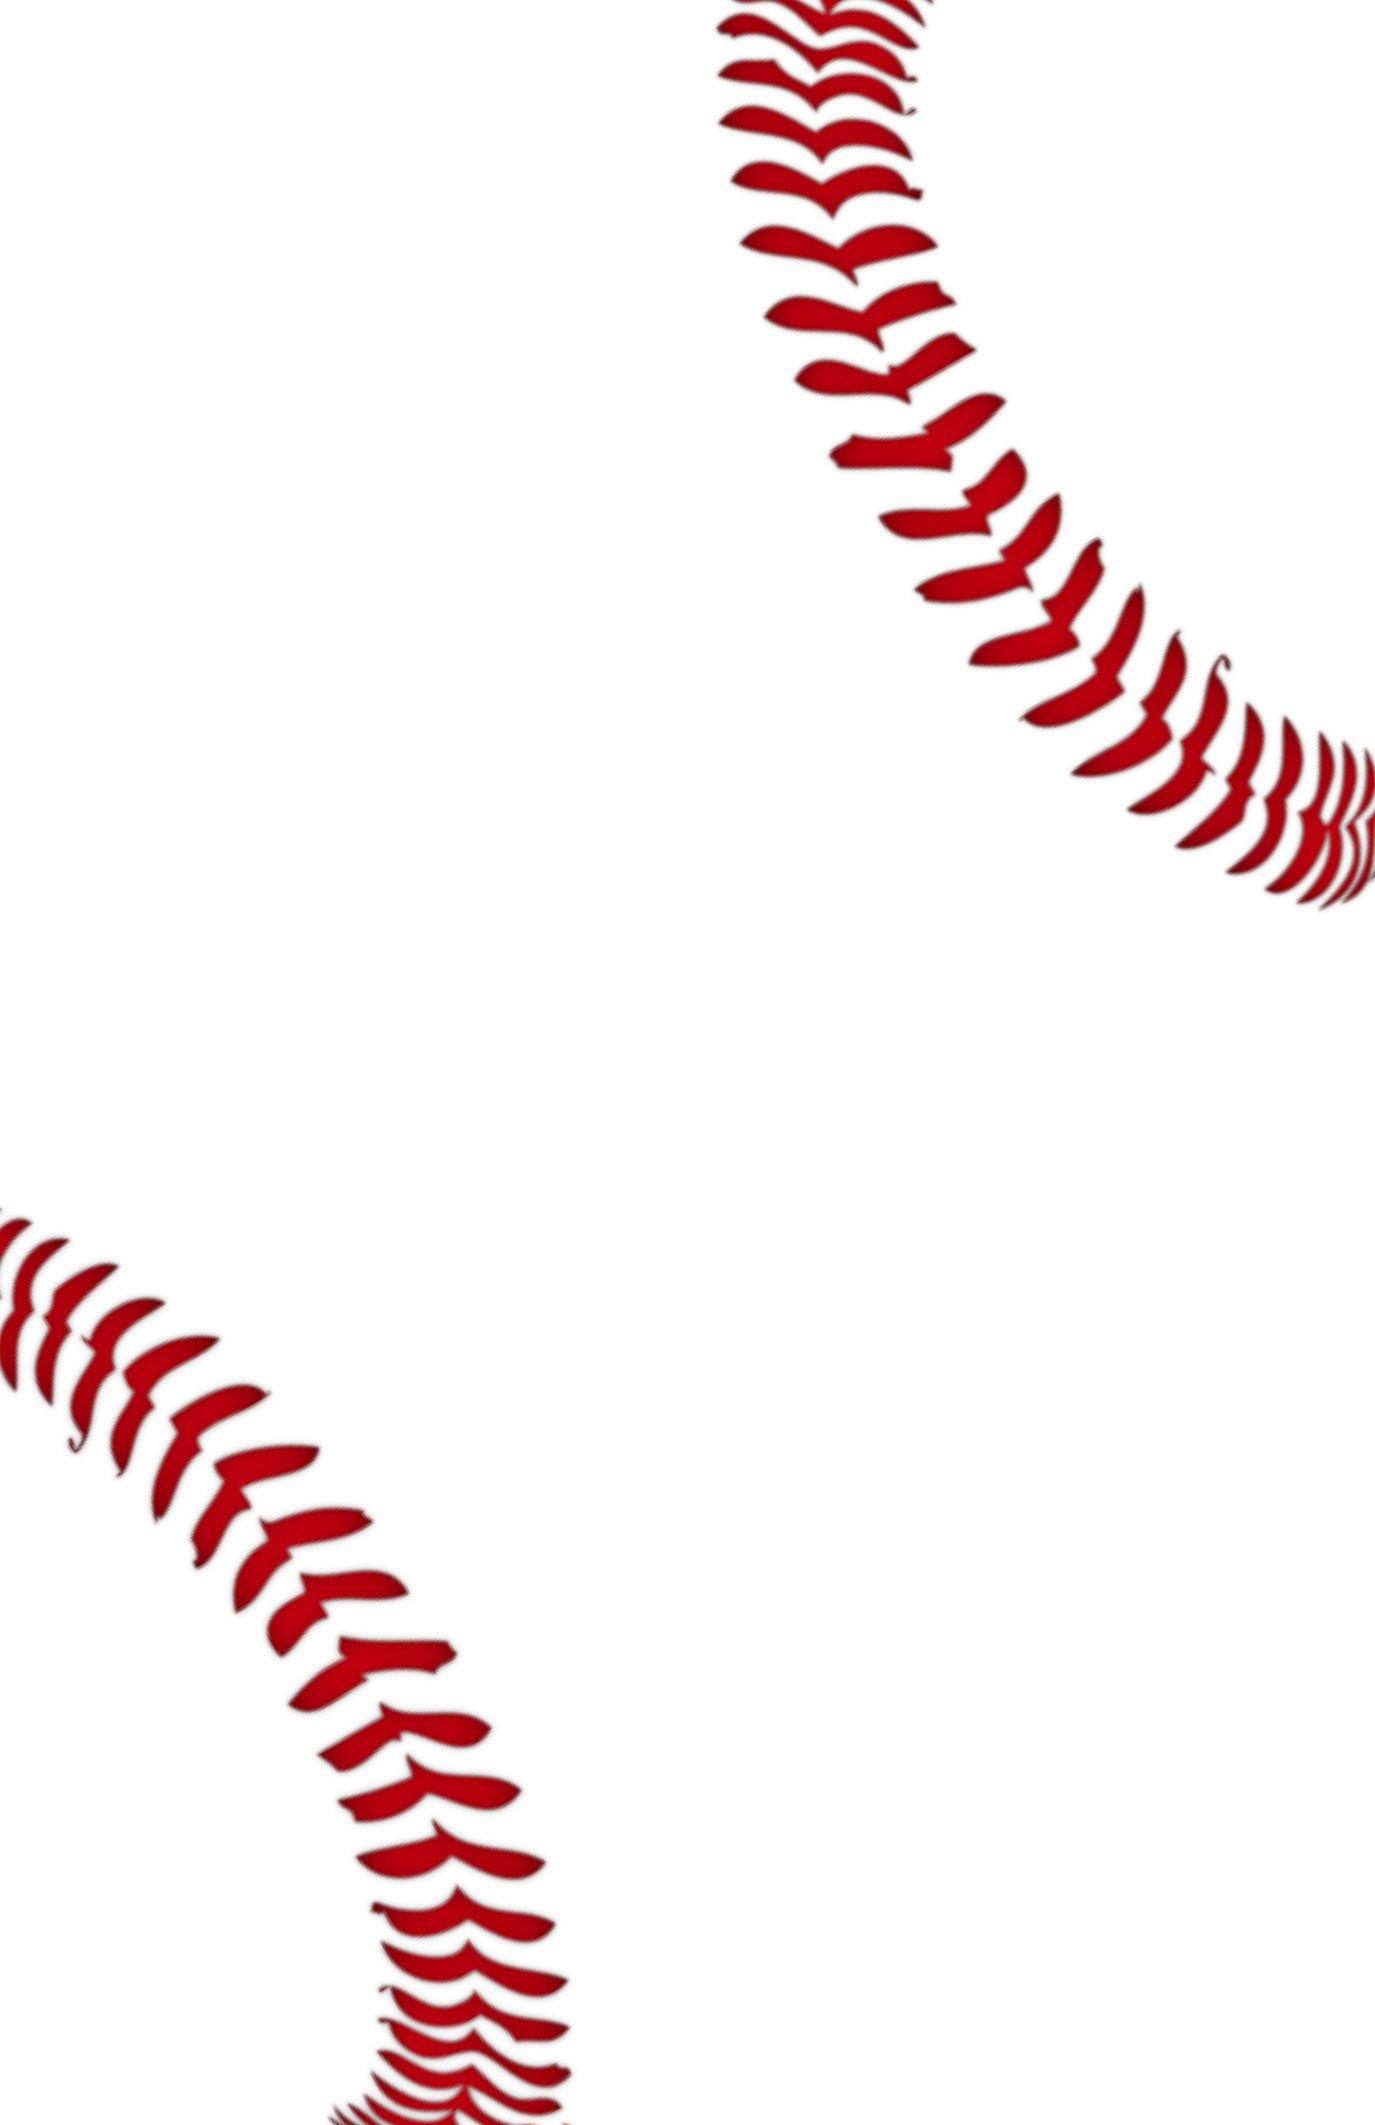 Baseball Party Invitations Free Printable | Party Ideas | Baseball - Free Printable Baseball Card Template